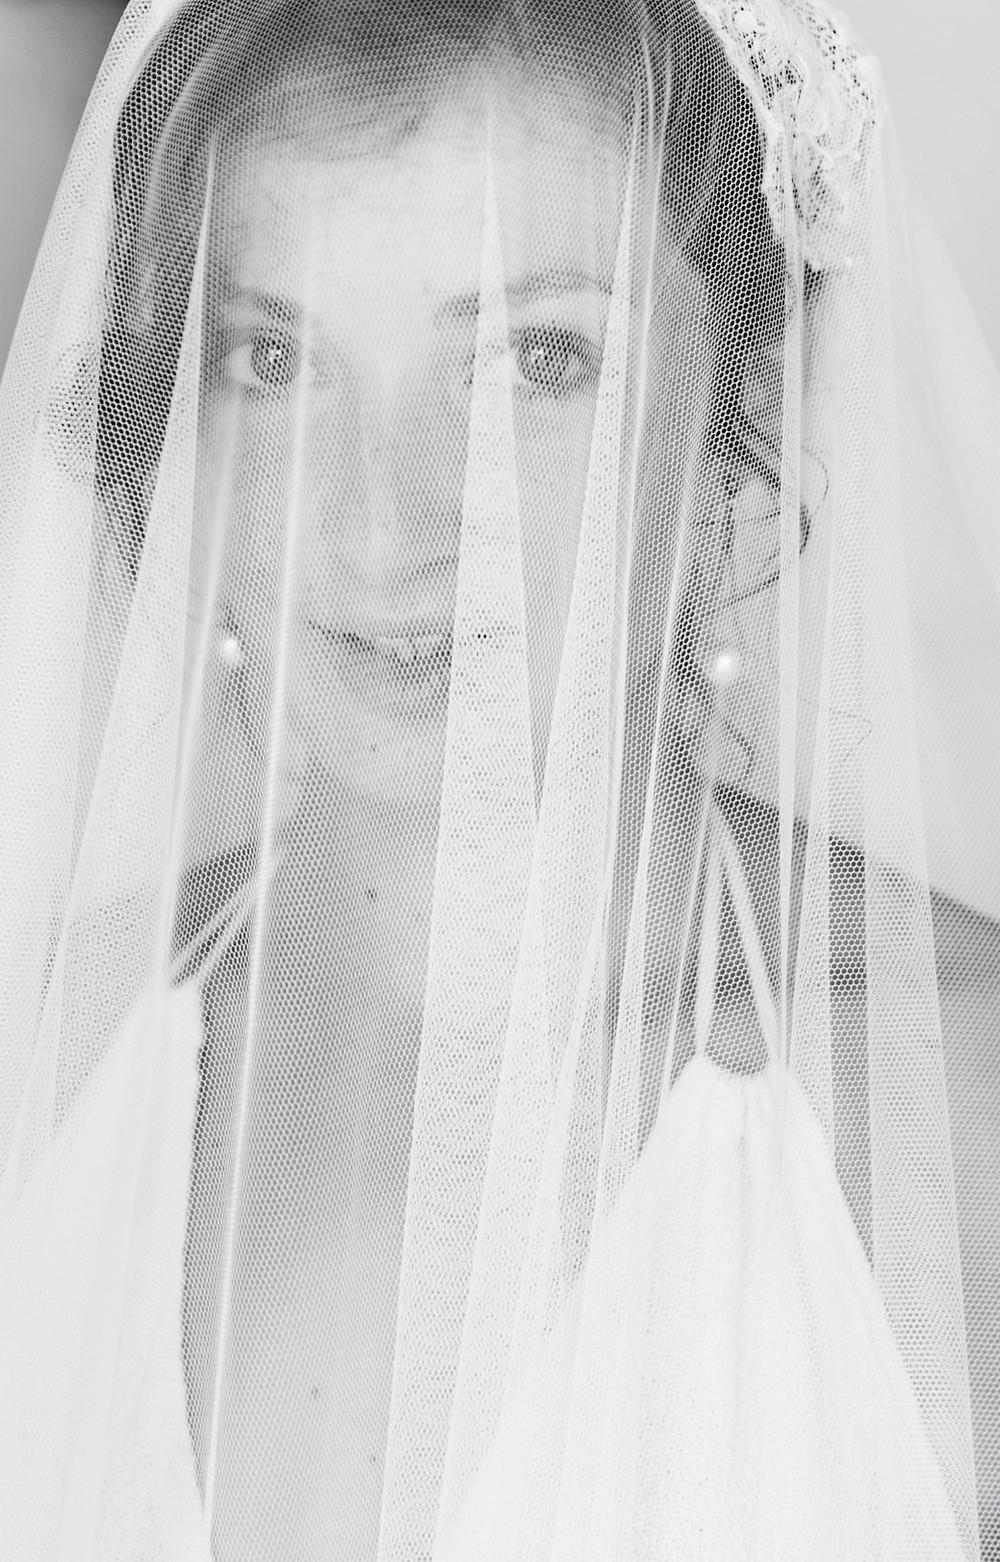 PHOTOGRAPHE GUADELOUPE. MARIAGE GUADELOUPE. PHOTOGRAPHE DE MARIAGE EN GUADELOUPE. SMILE AND SHINE PHOTOGRAPHY